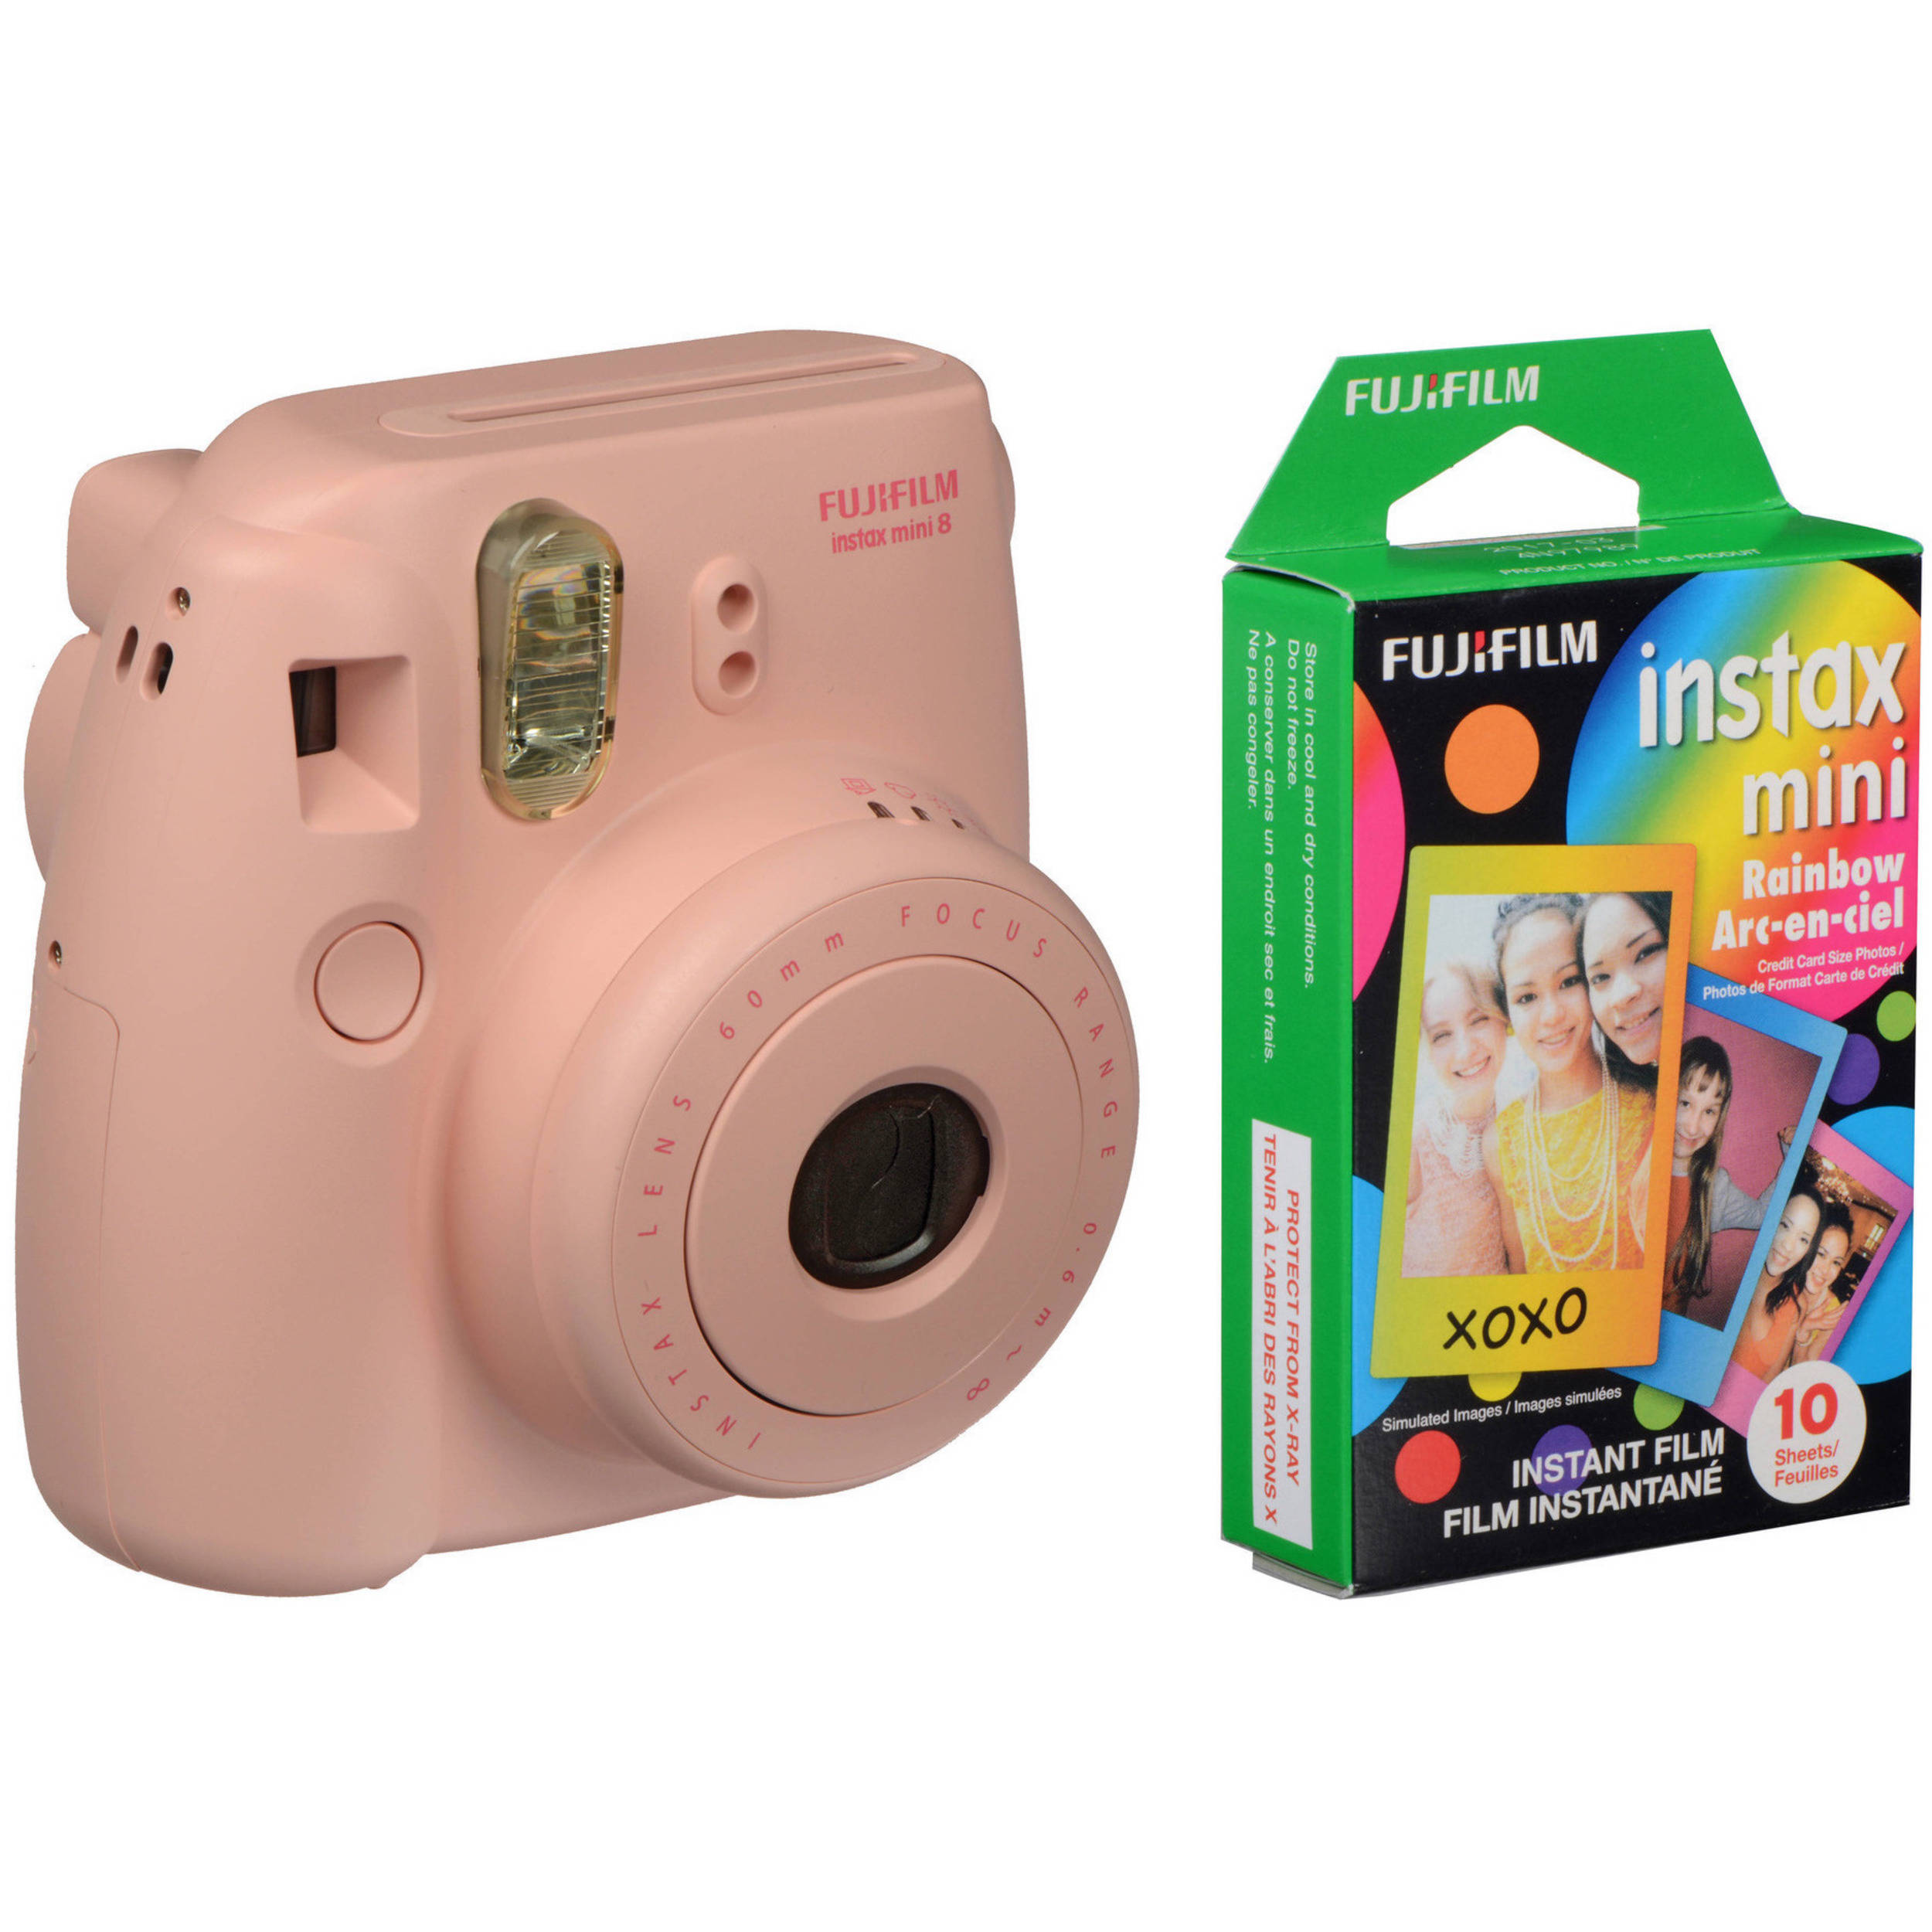 fujifilm instax mini 8 instant film camera 16273415 b h. Black Bedroom Furniture Sets. Home Design Ideas